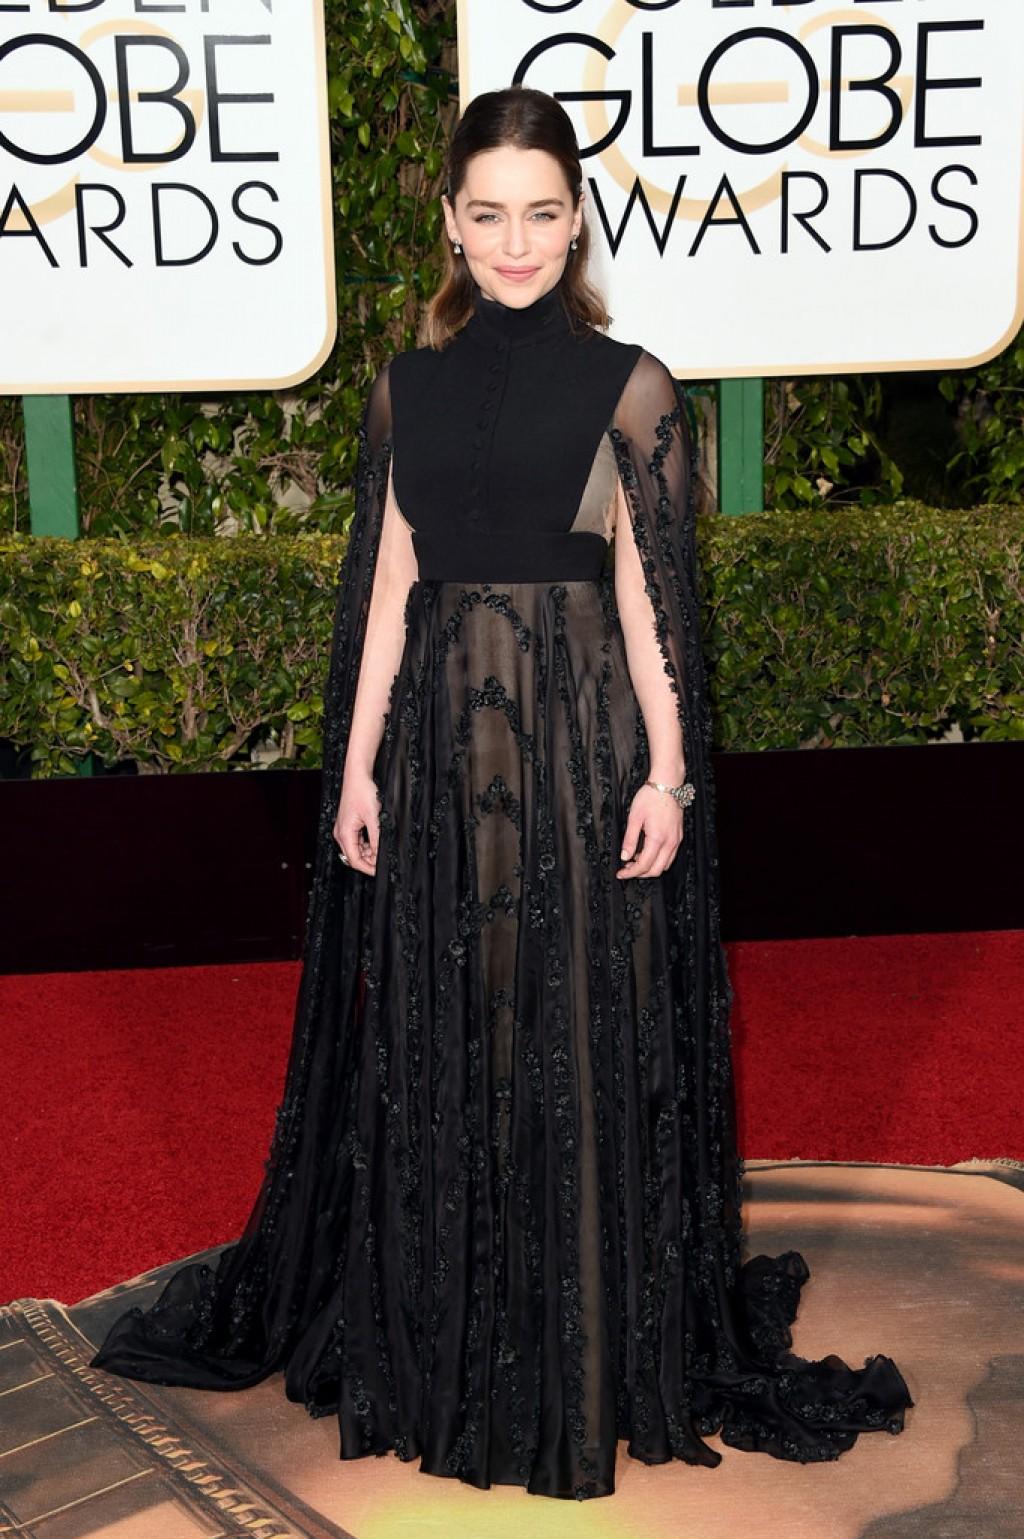 Emilia-Clarke-2016-Golden-Globes-Valentino-dress-1024x1539